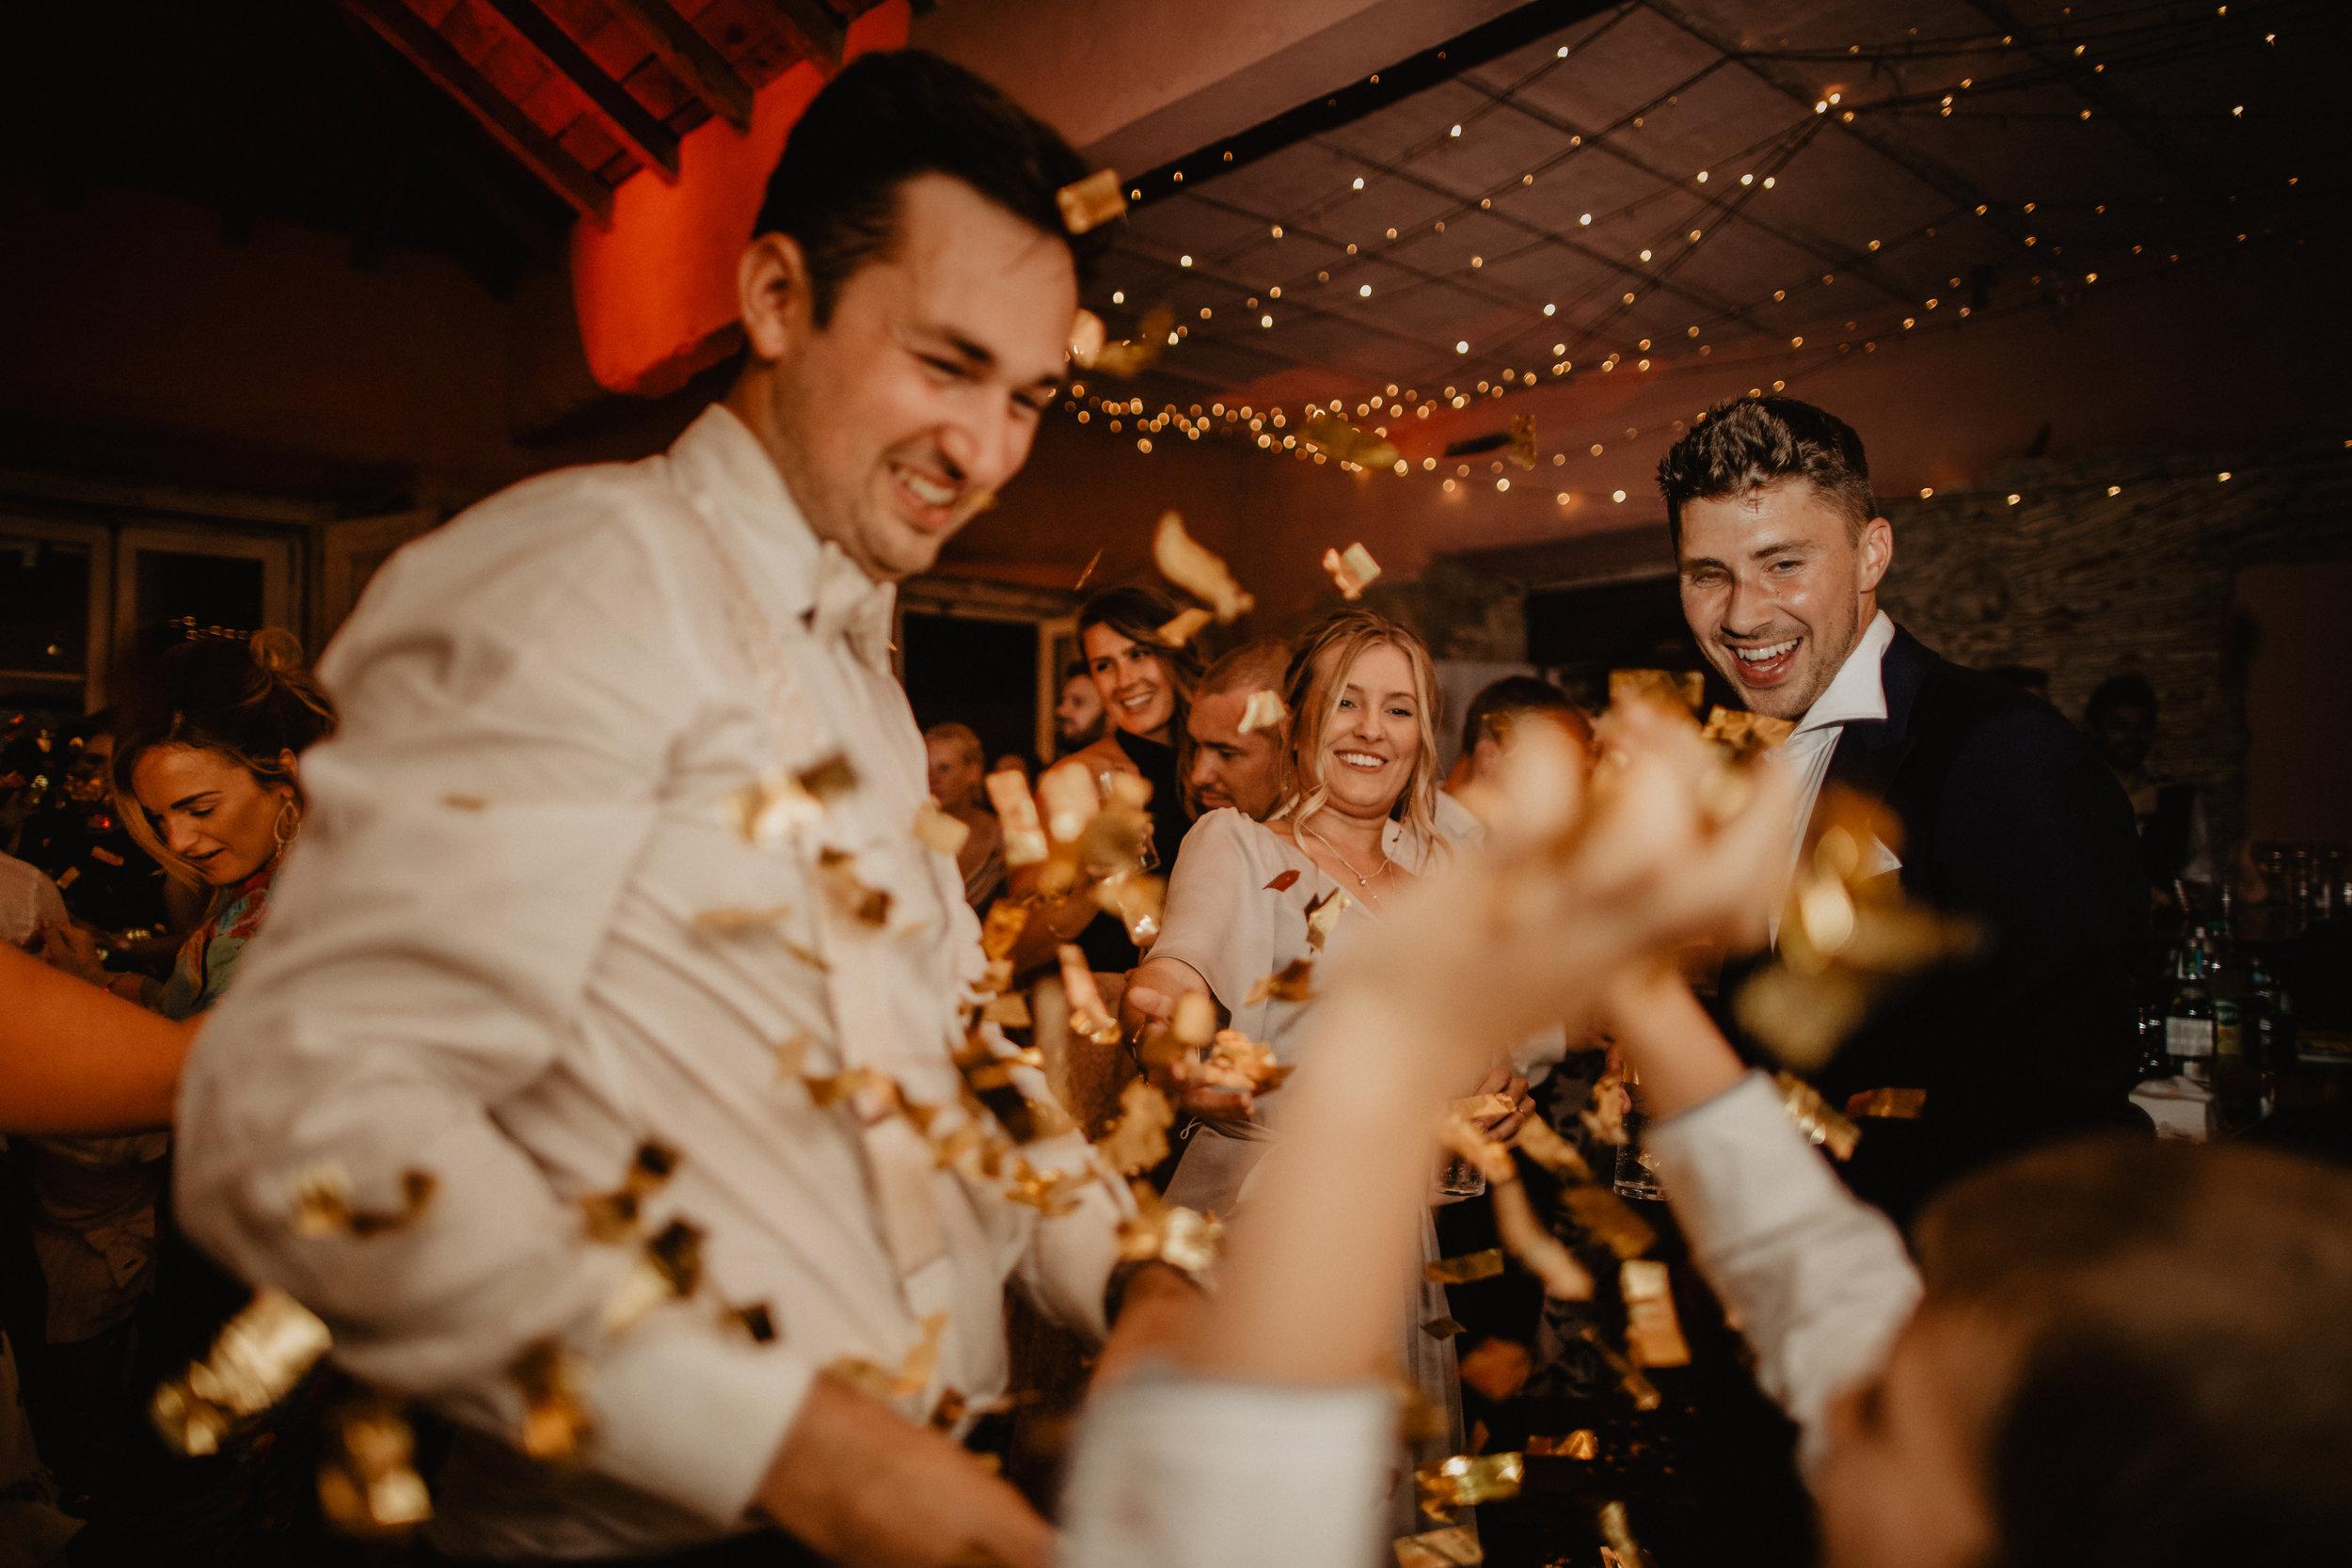 Lapela-photography-wedding-sintra-portugal-132.jpg